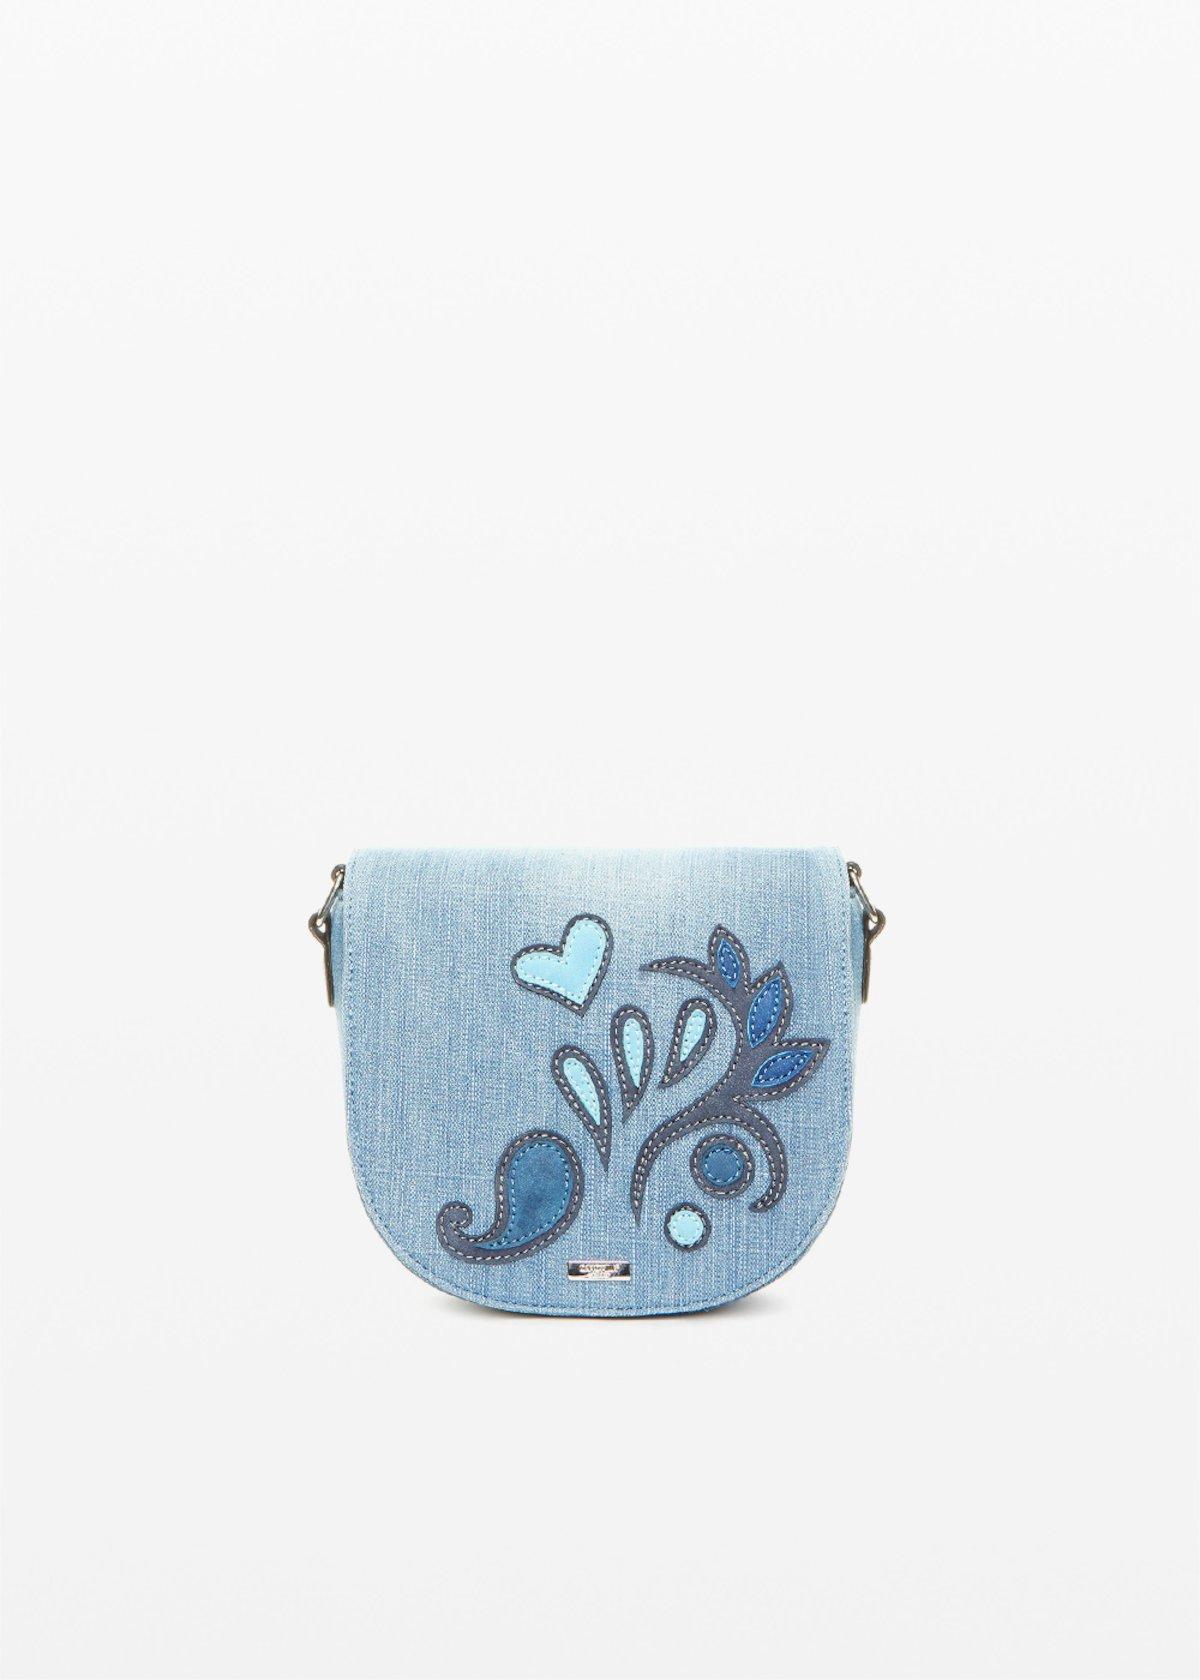 Crossbody bag Blerry effetto denim con patch flower - Denim - Donna - Immagine categoria